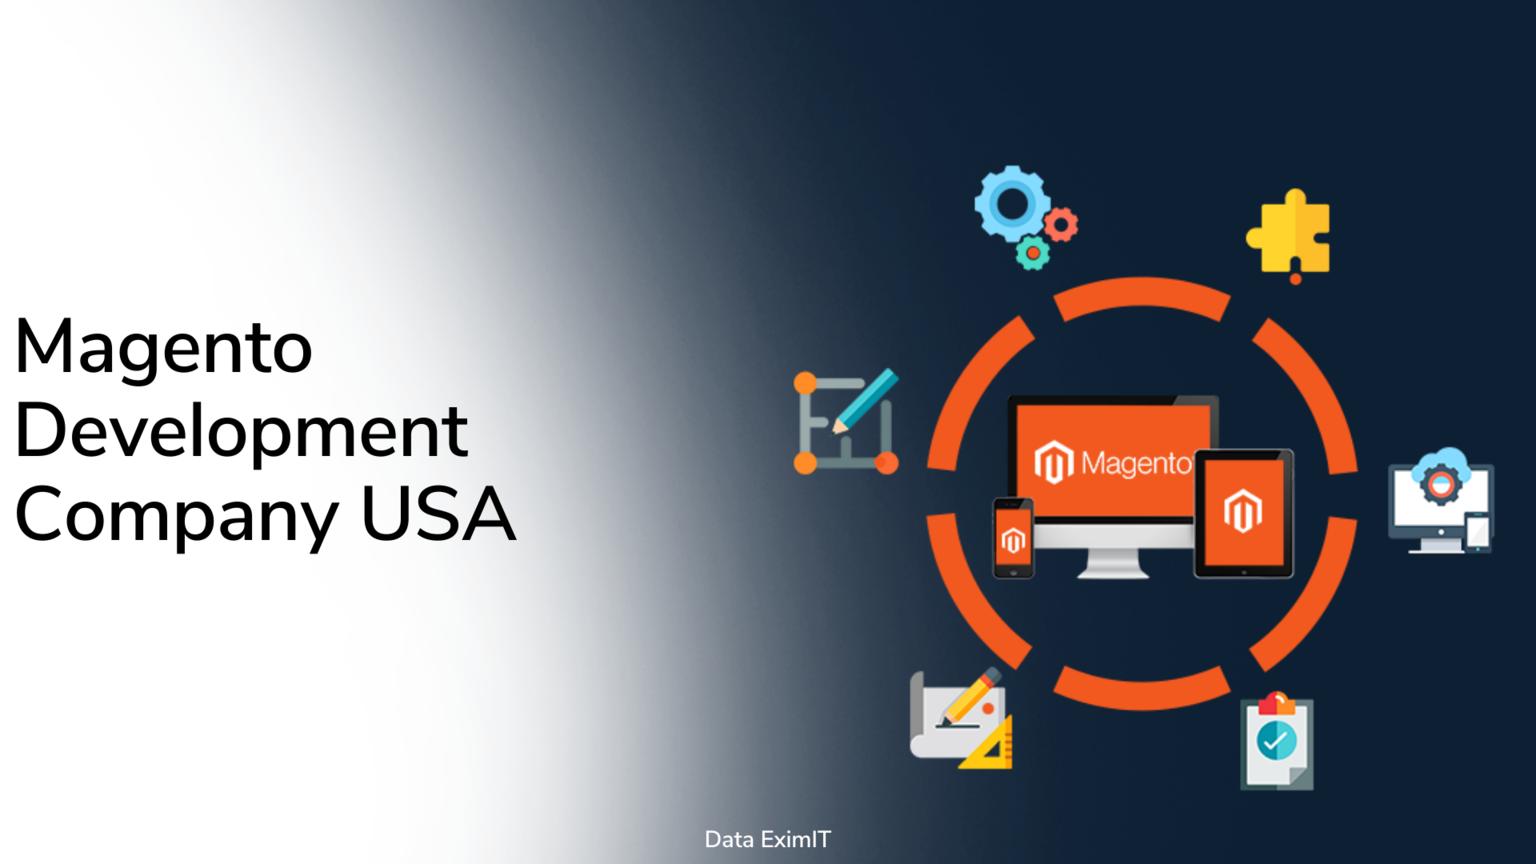 Magento Development Company USA